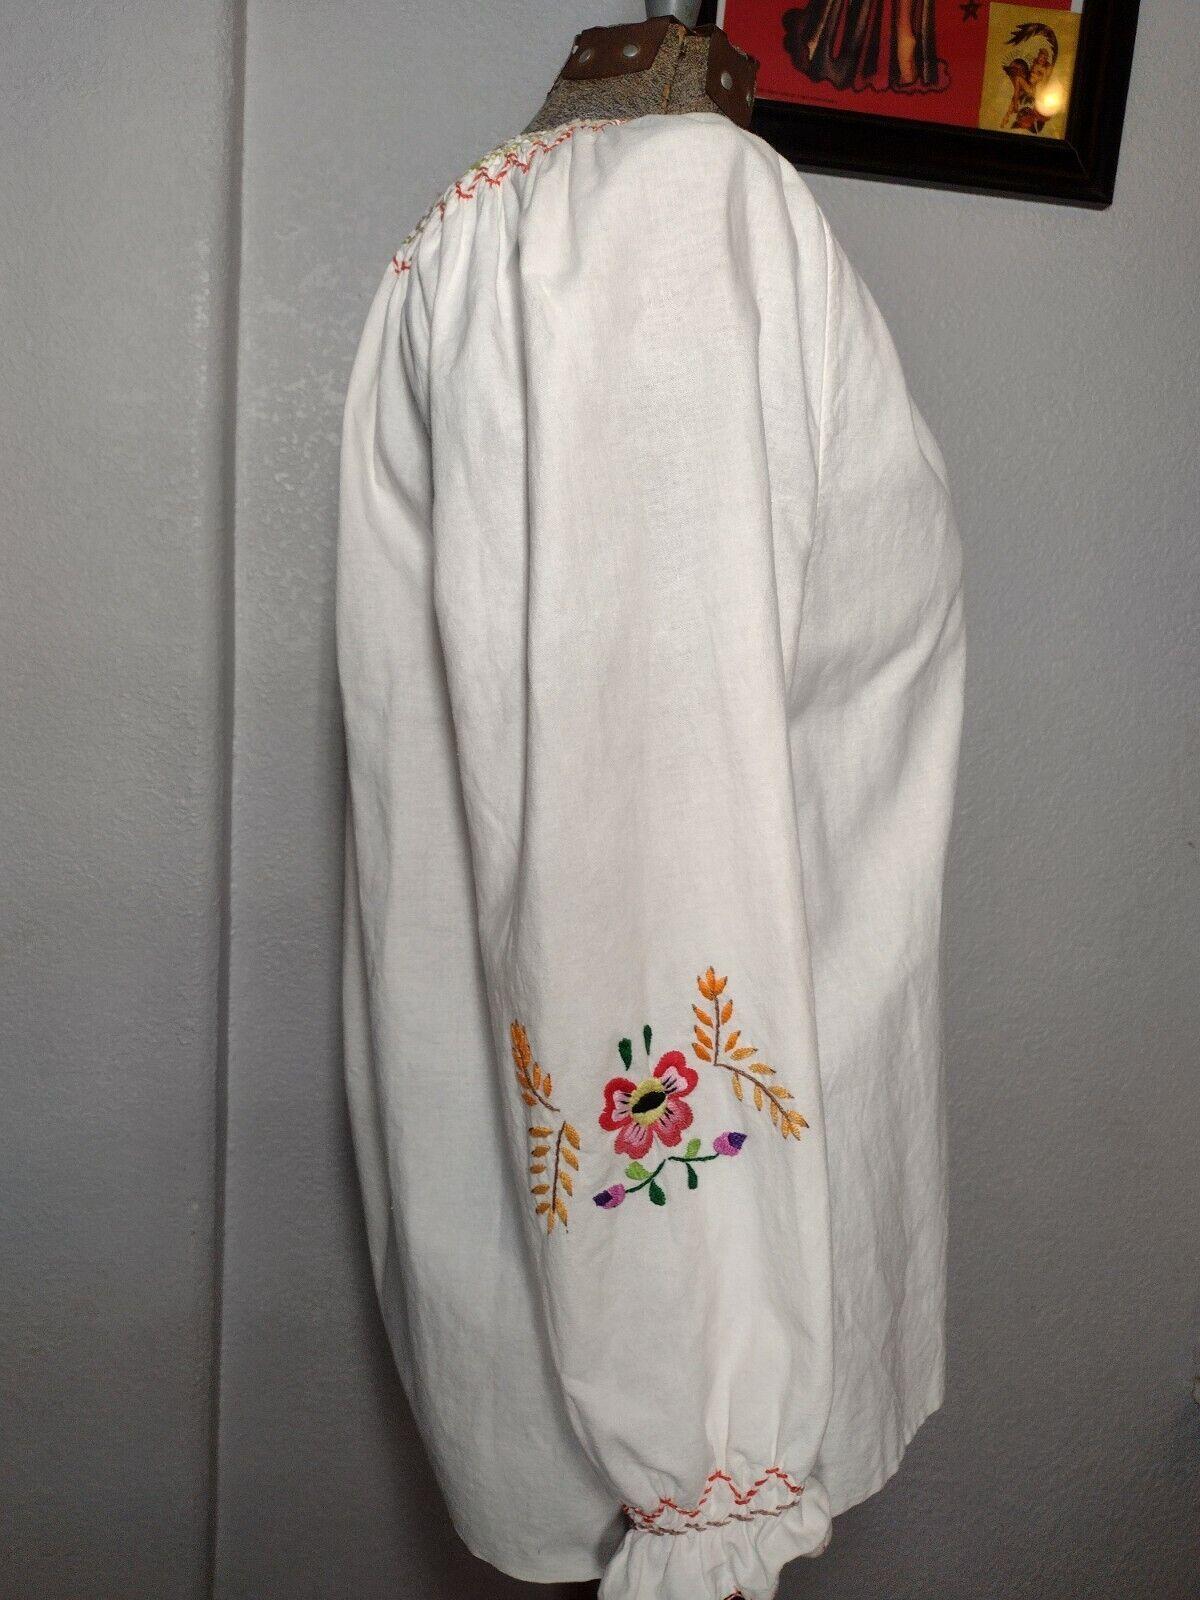 vintage hungarian blouse - image 6